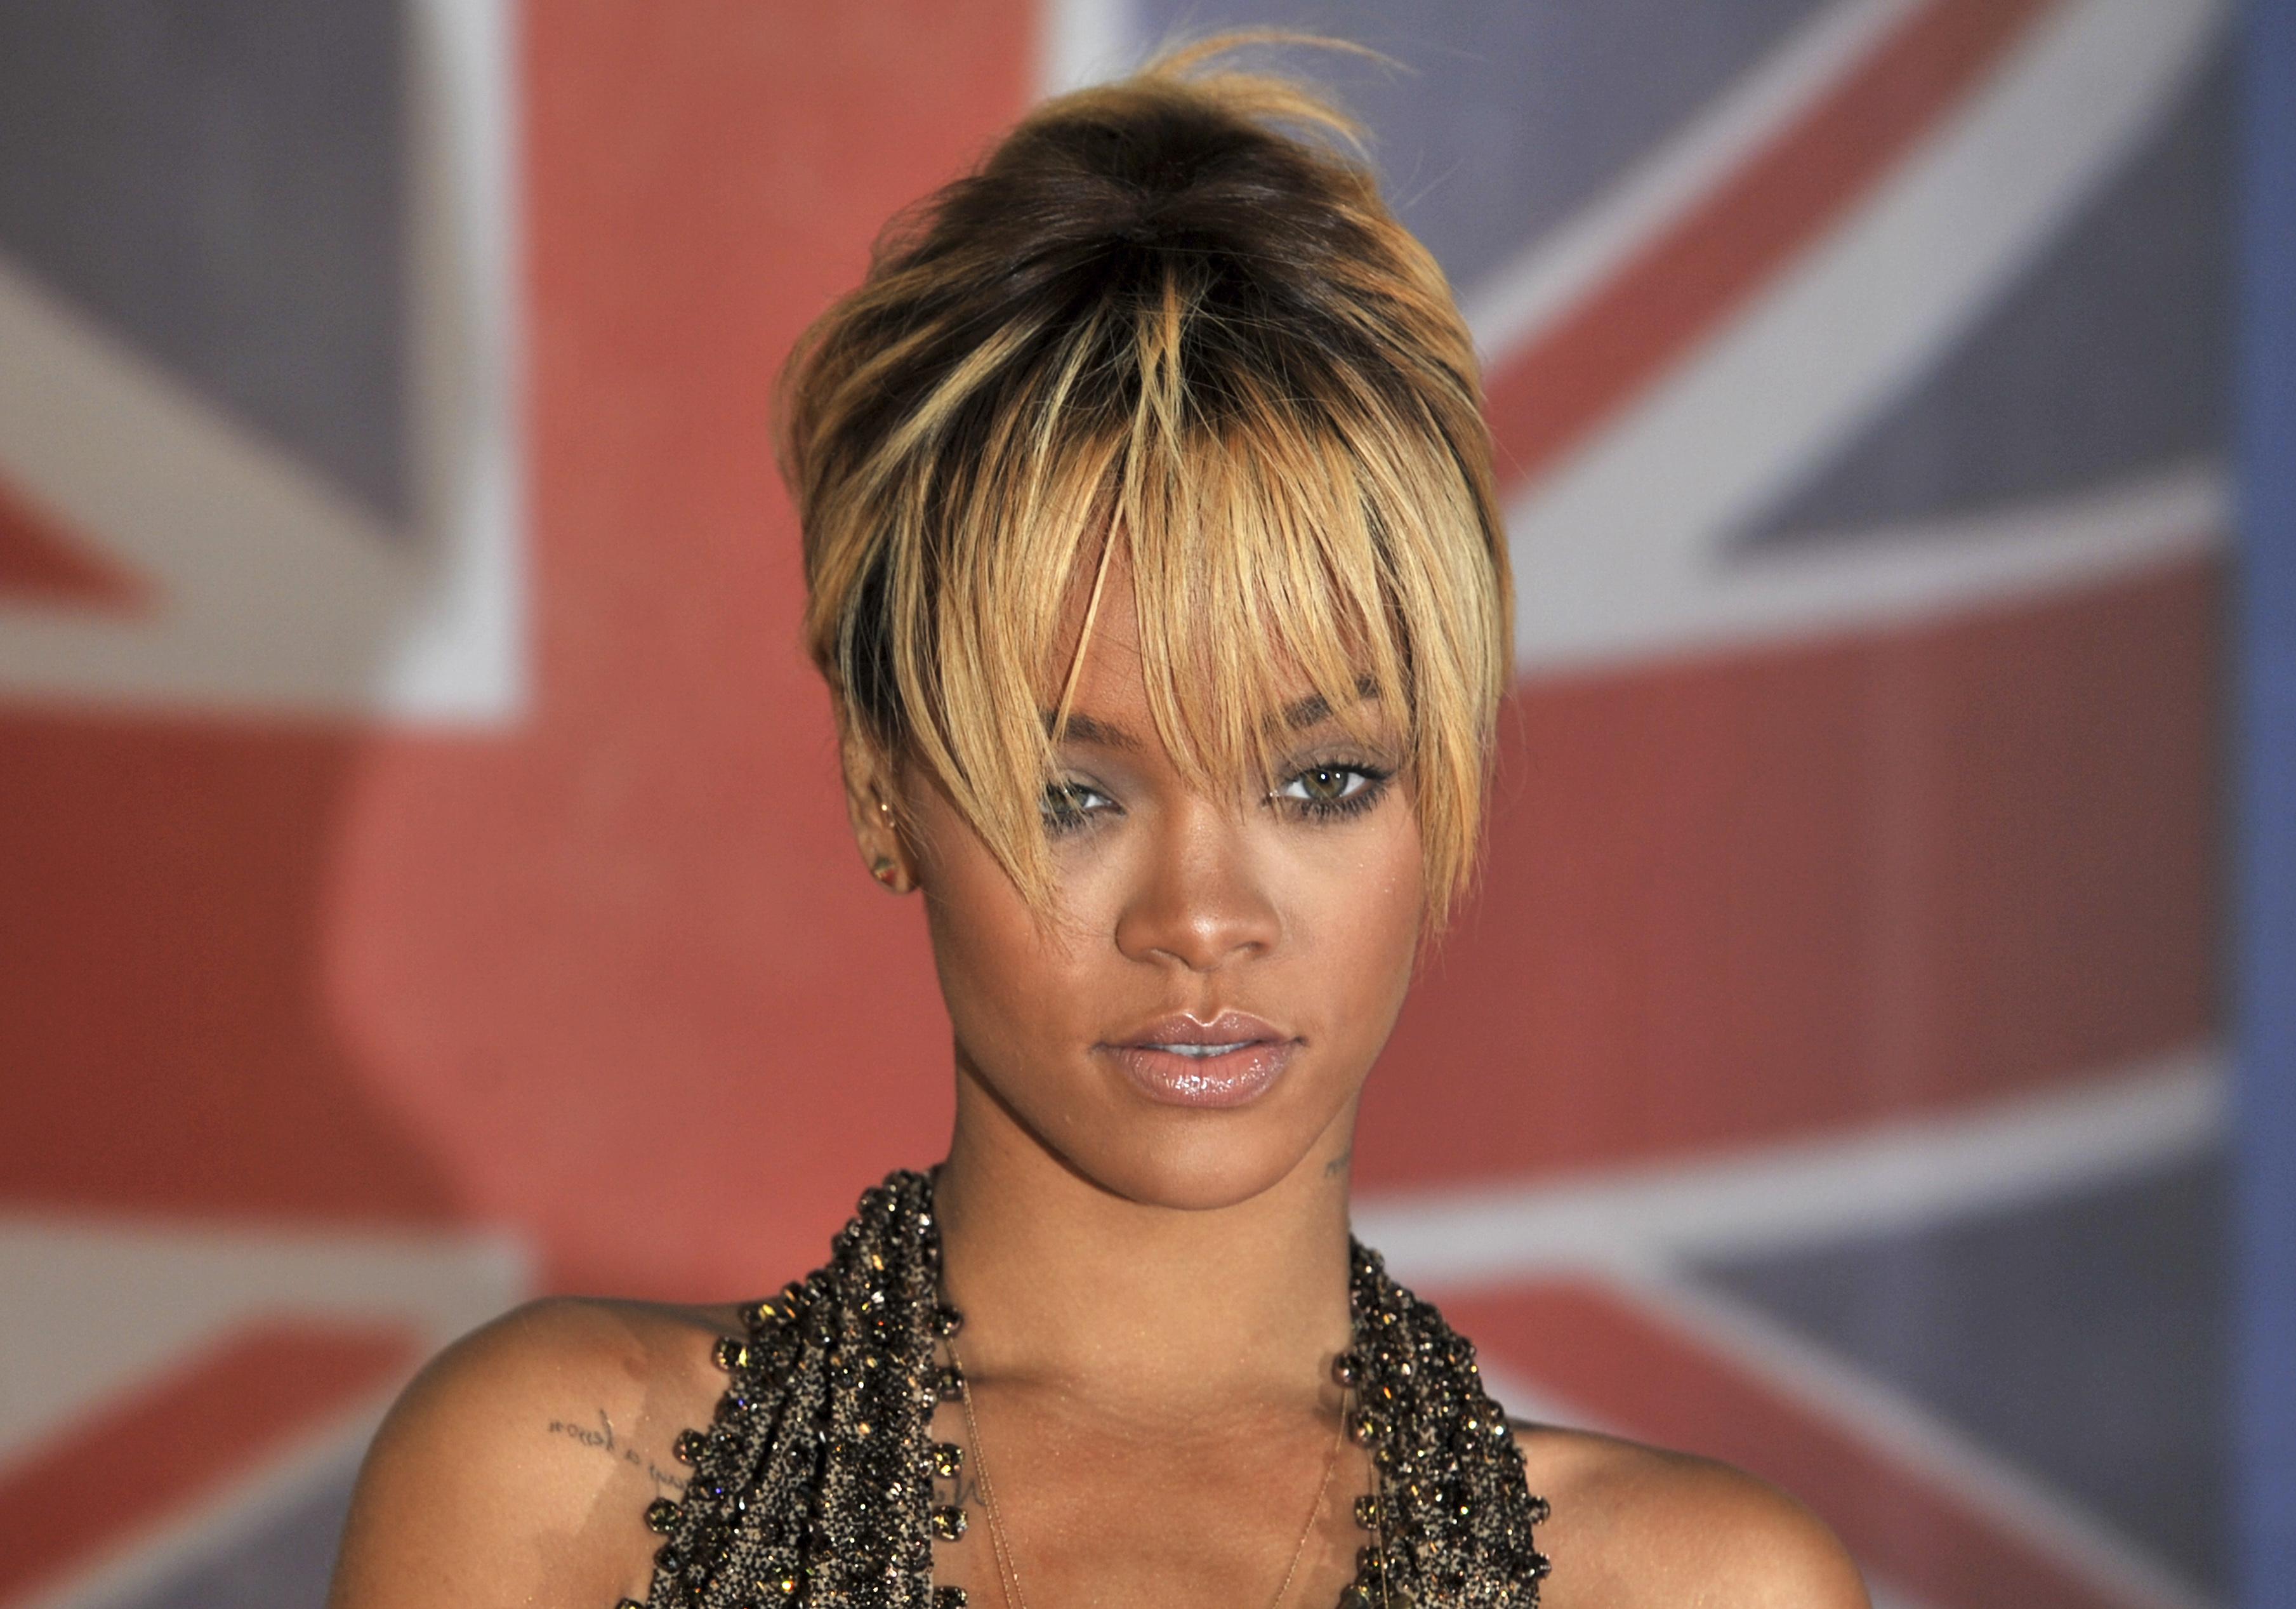 Frends Headphones From Shark Tank Are Available Now Rihanna S Already A Fan